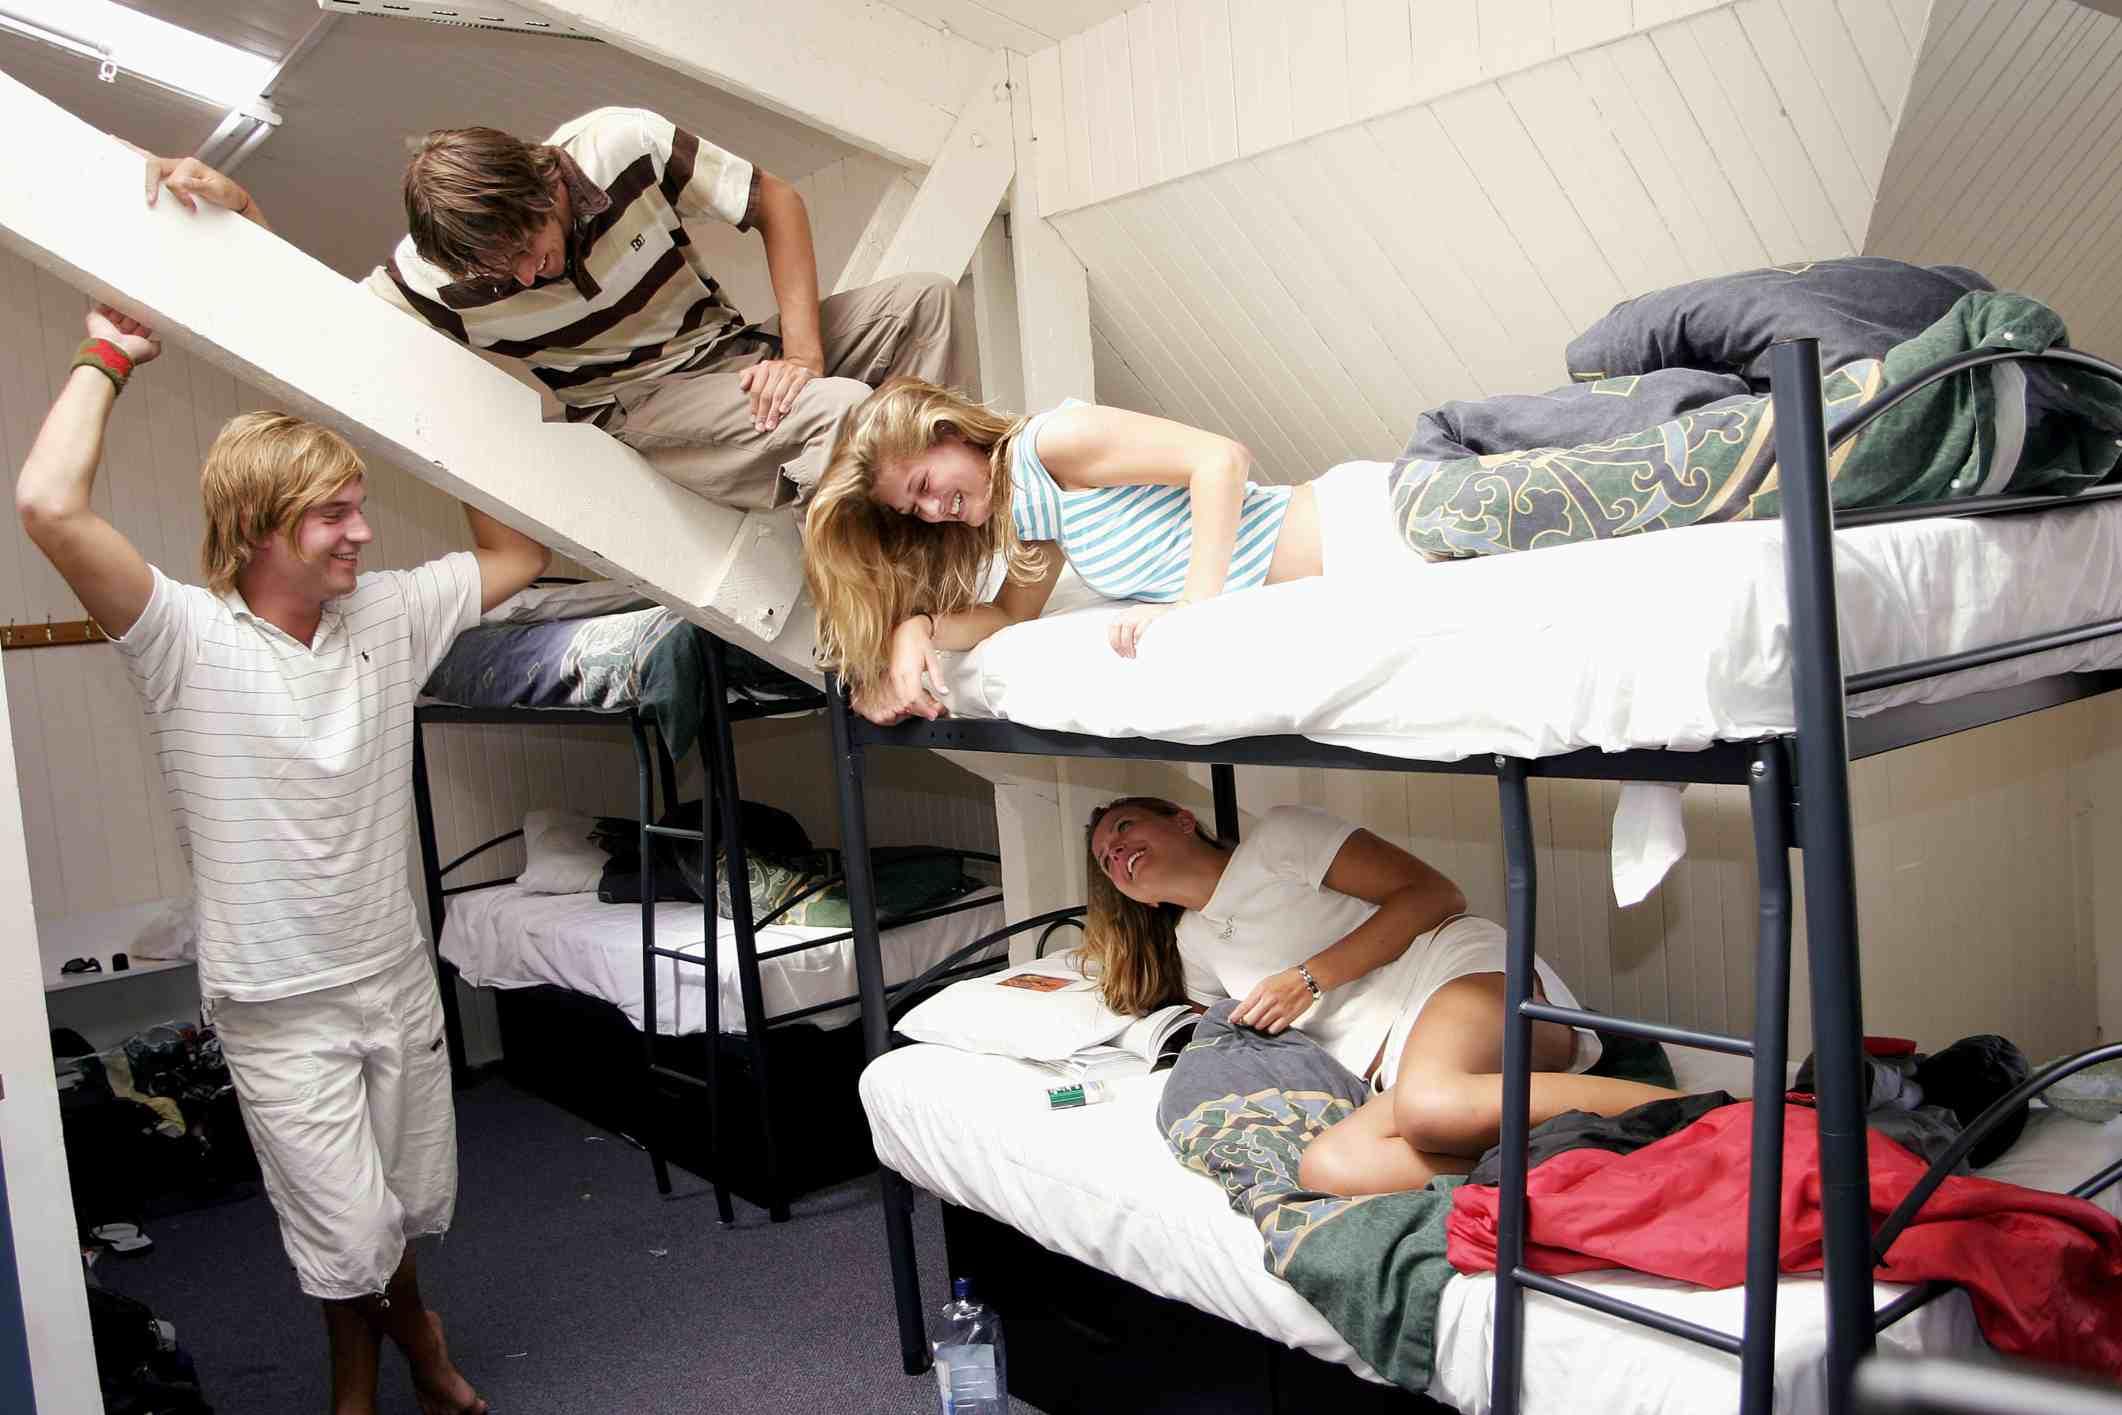 Hostel life: fun and sociable!